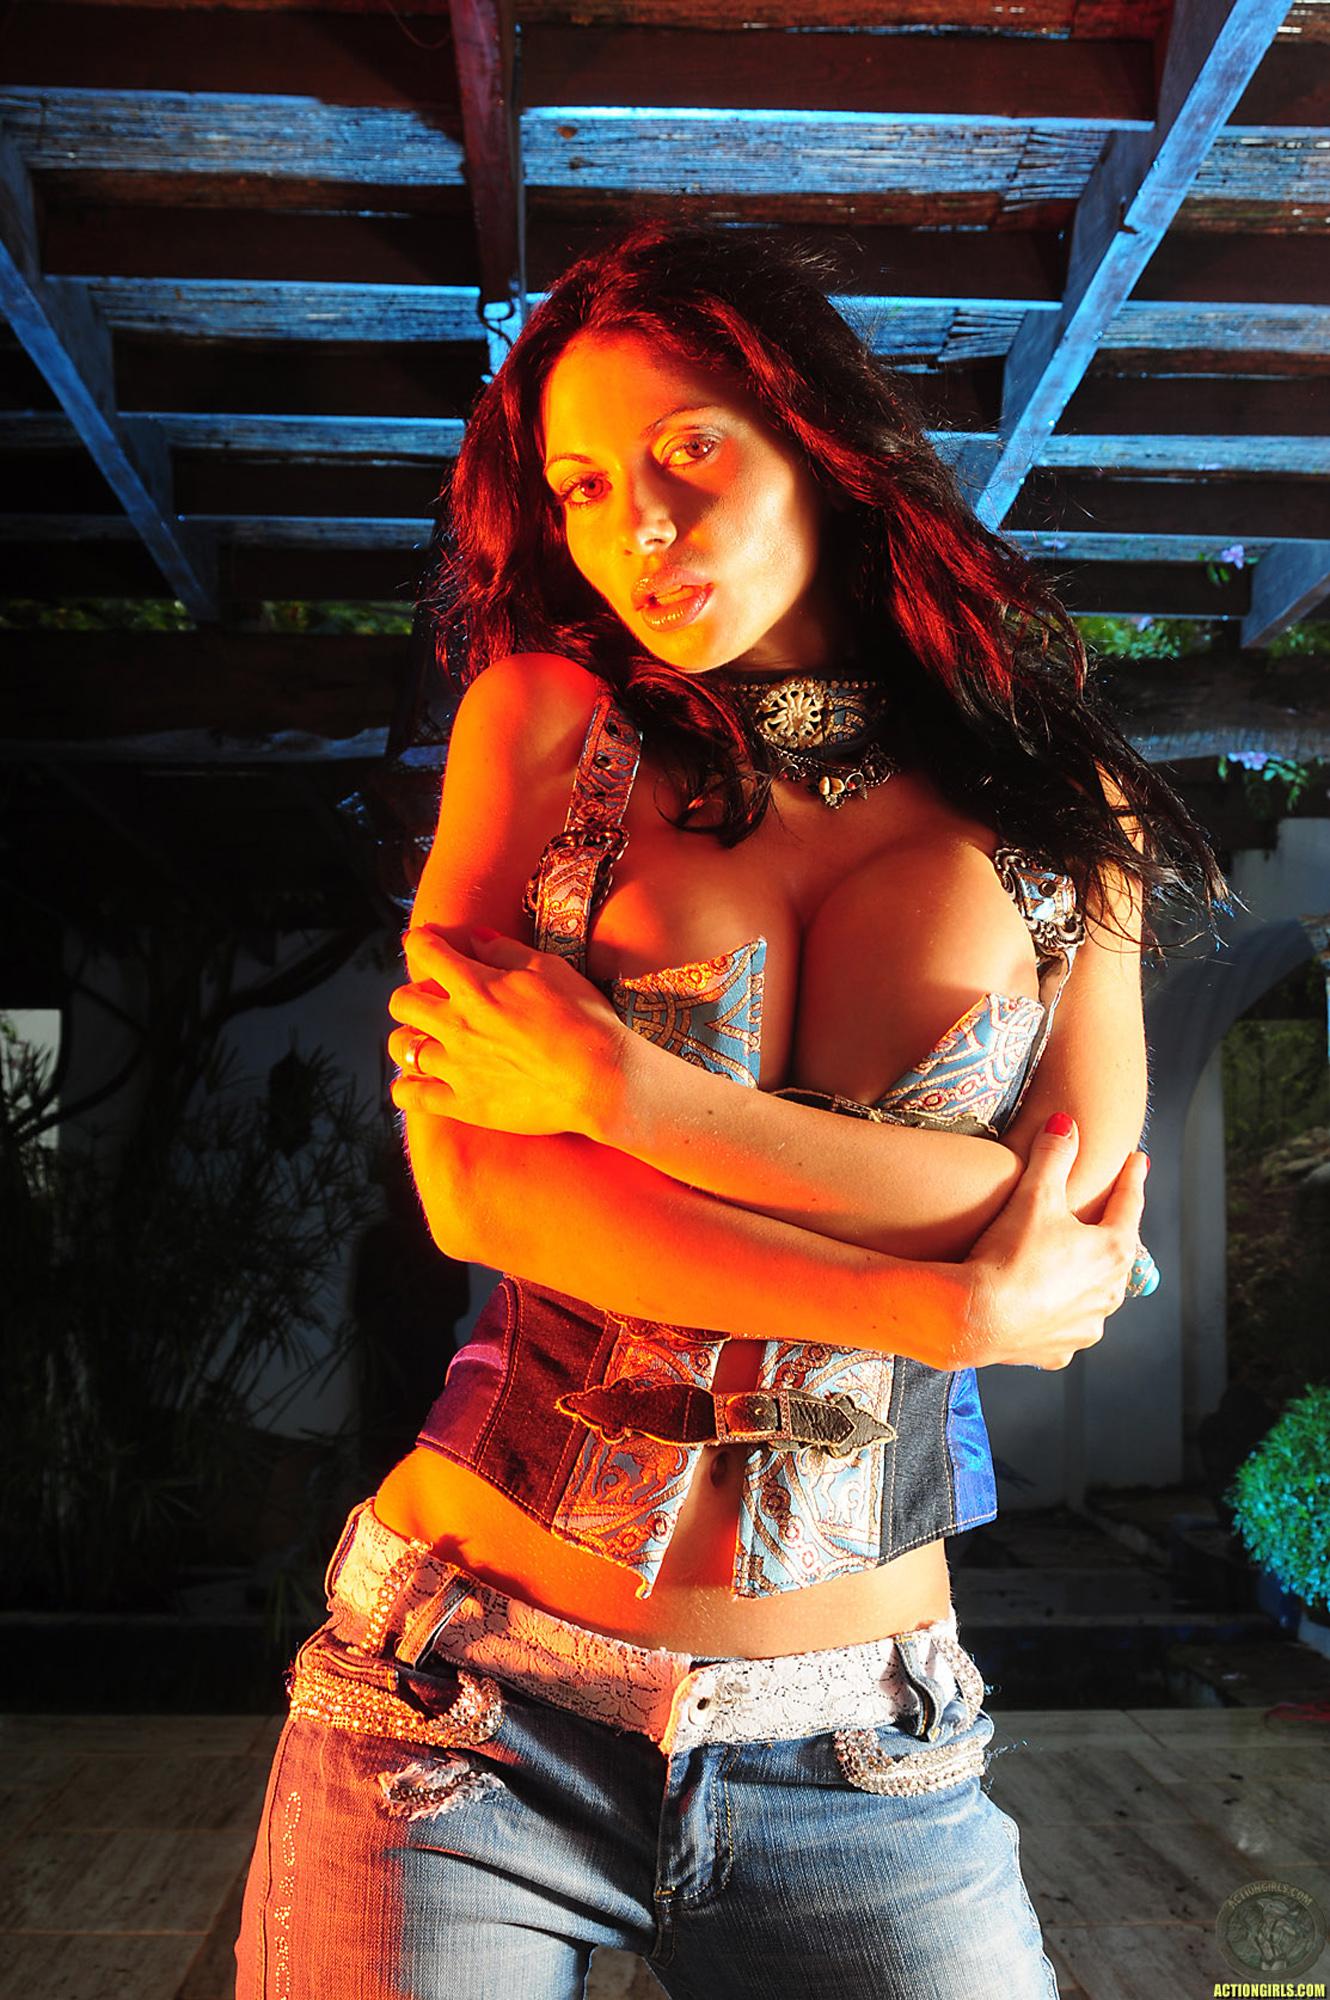 Veronica Zemanova Porn Star 44